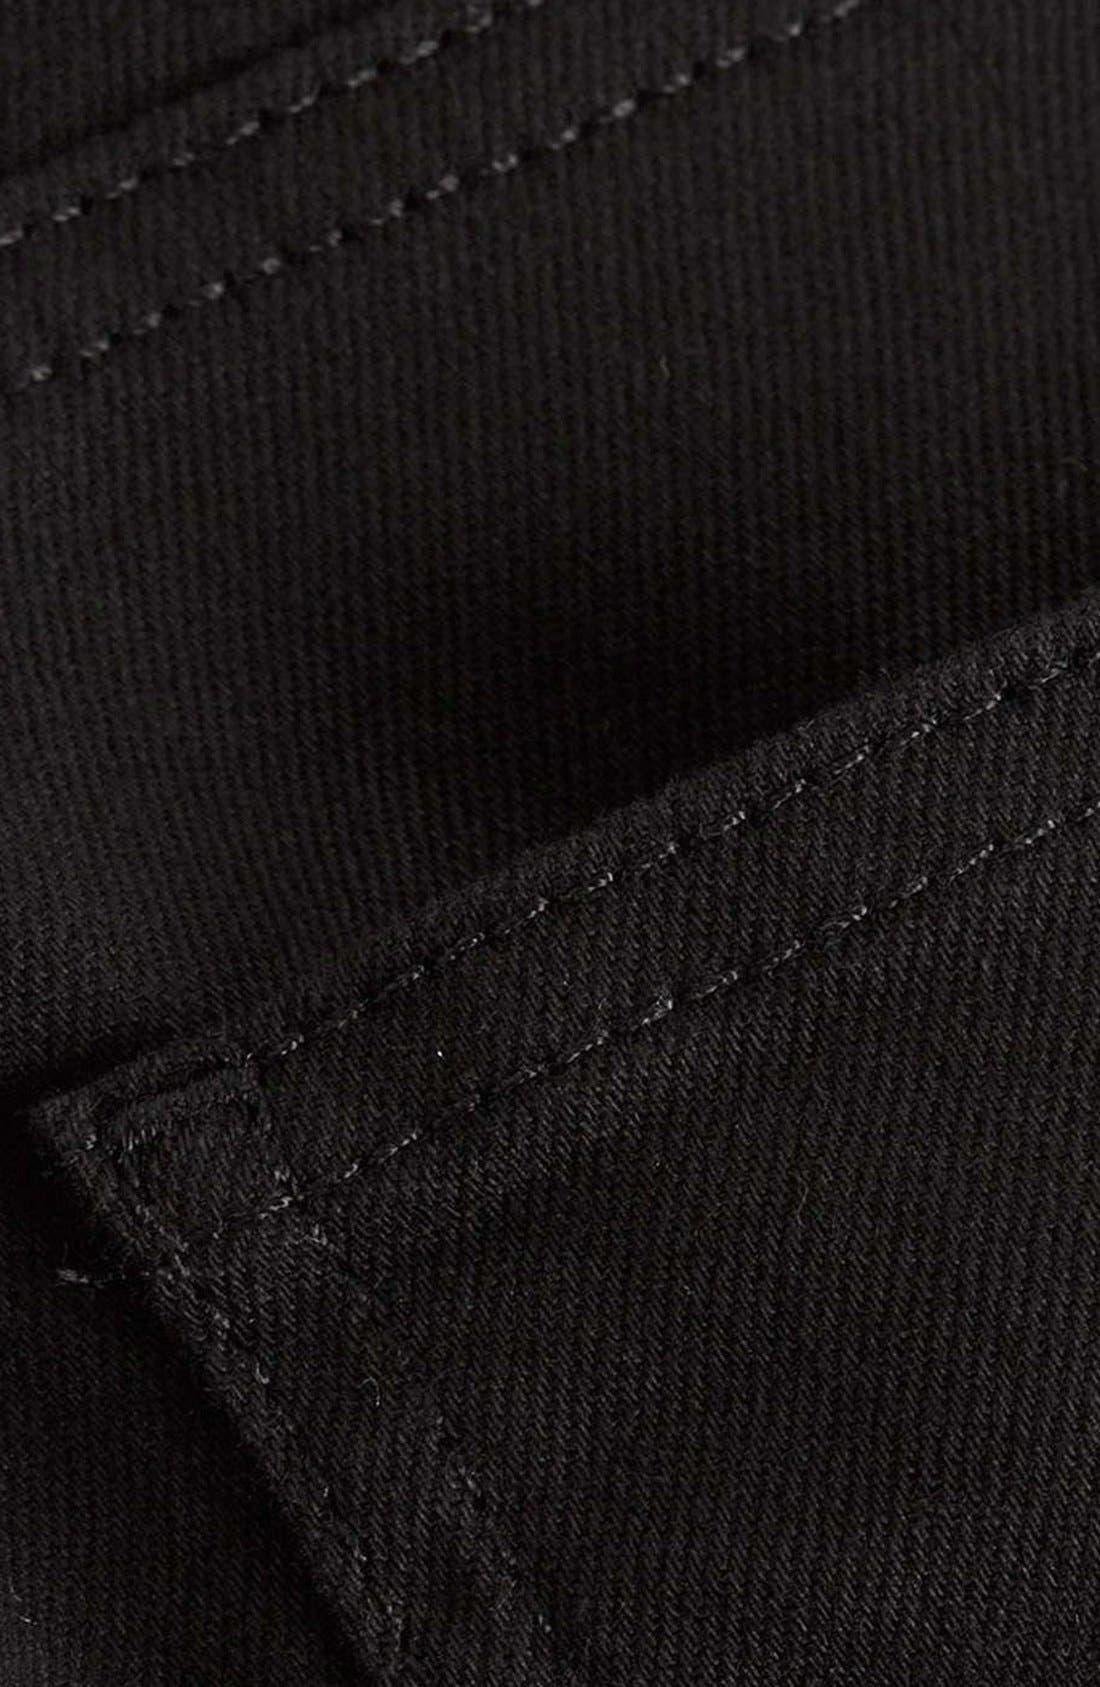 Skinny Stretch Jeans,                             Alternate thumbnail 8, color,                             BLACK